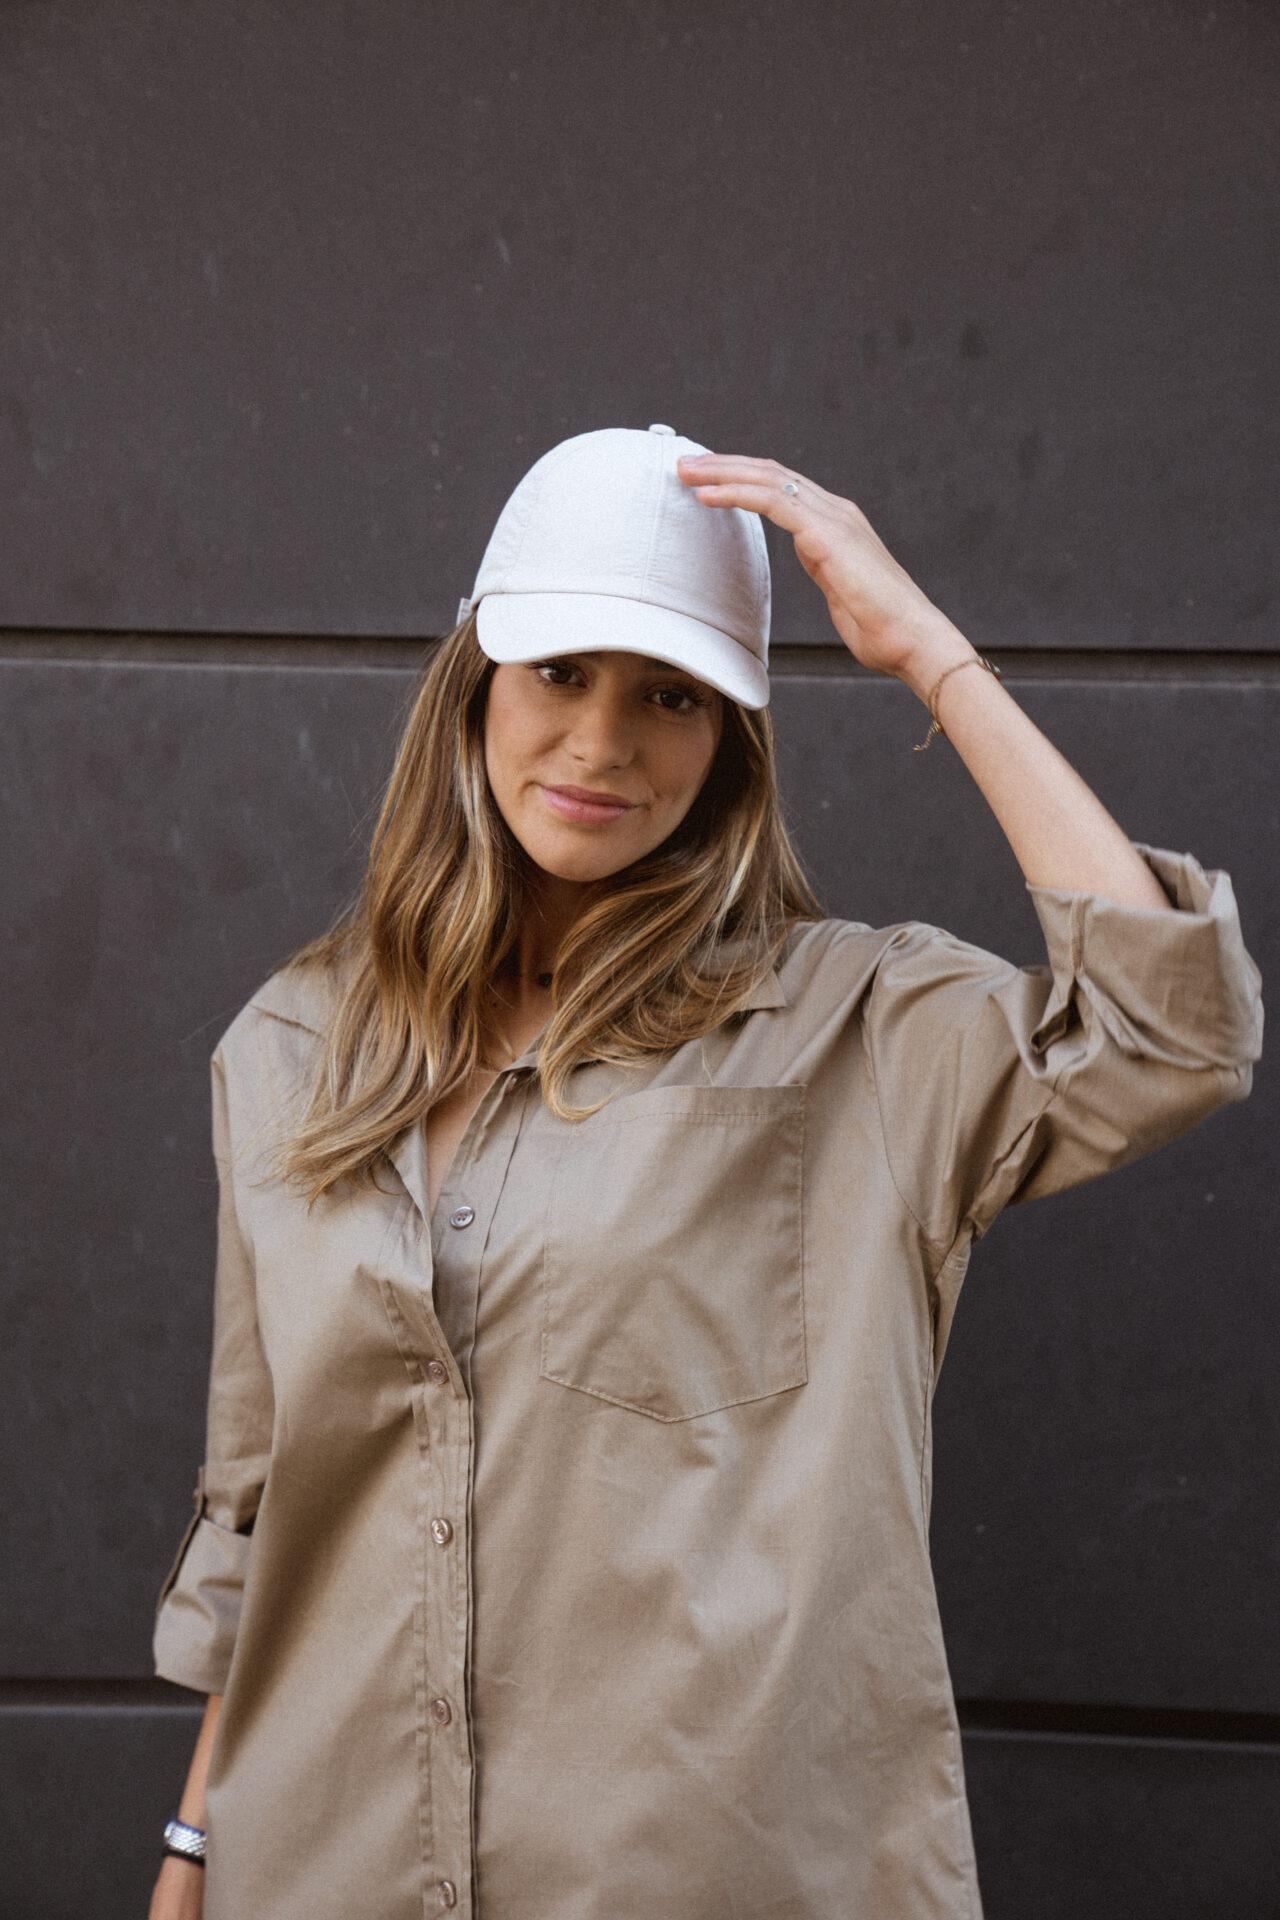 robe-chemise-beige-botte-de-pluie-casquette-femme-gisette-store (23)